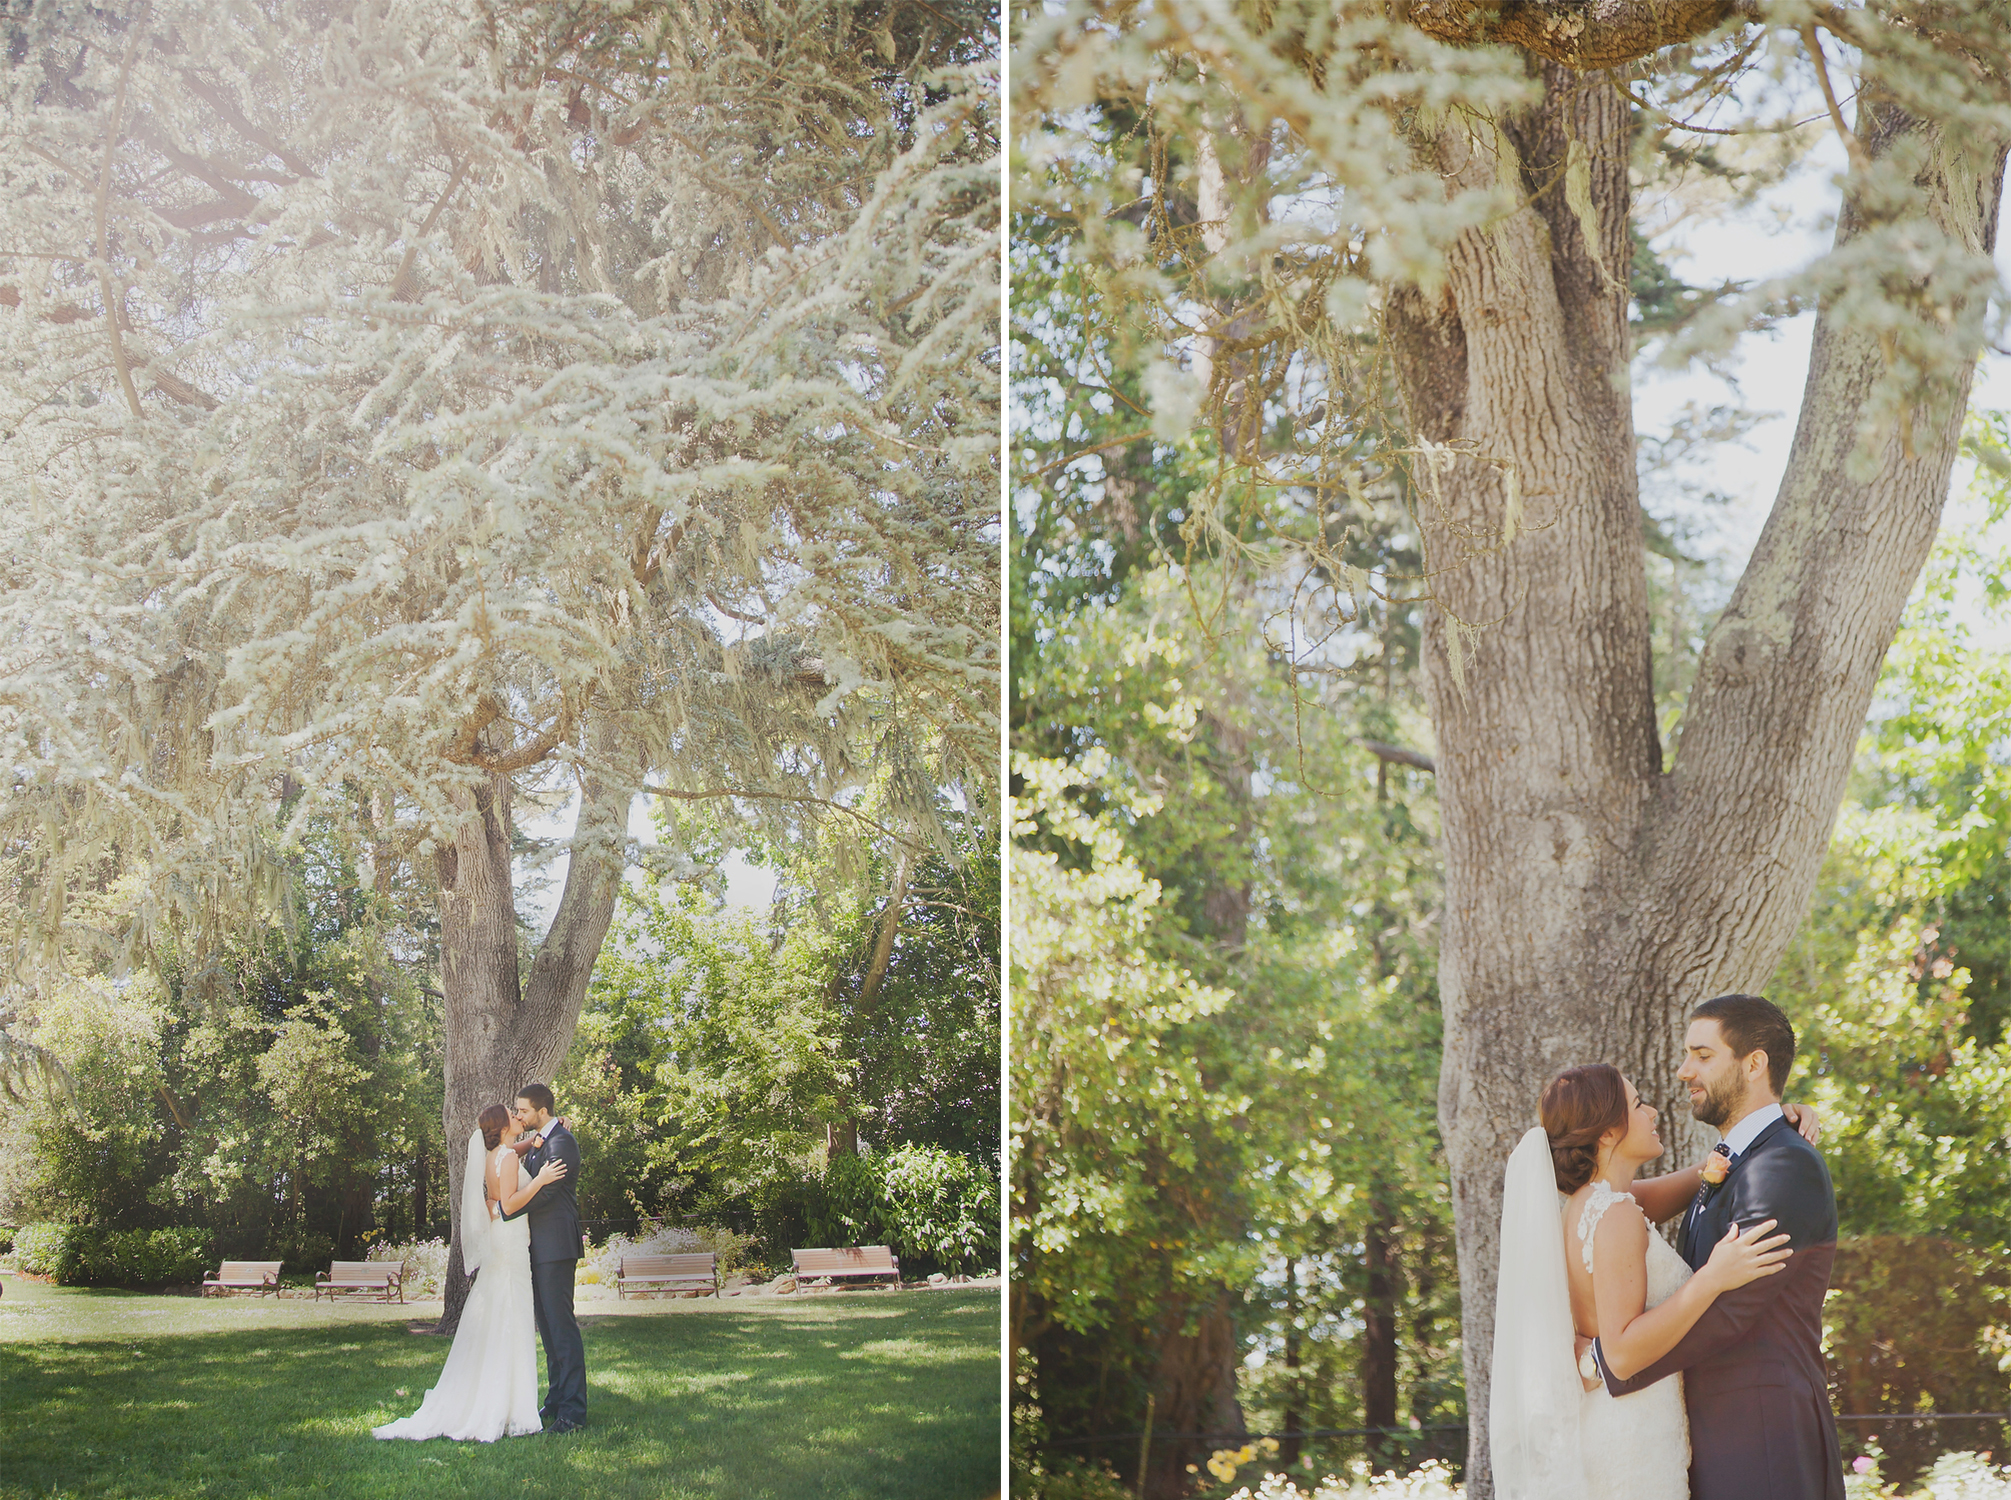 wellington wedding photography NZ - 0235.JPG